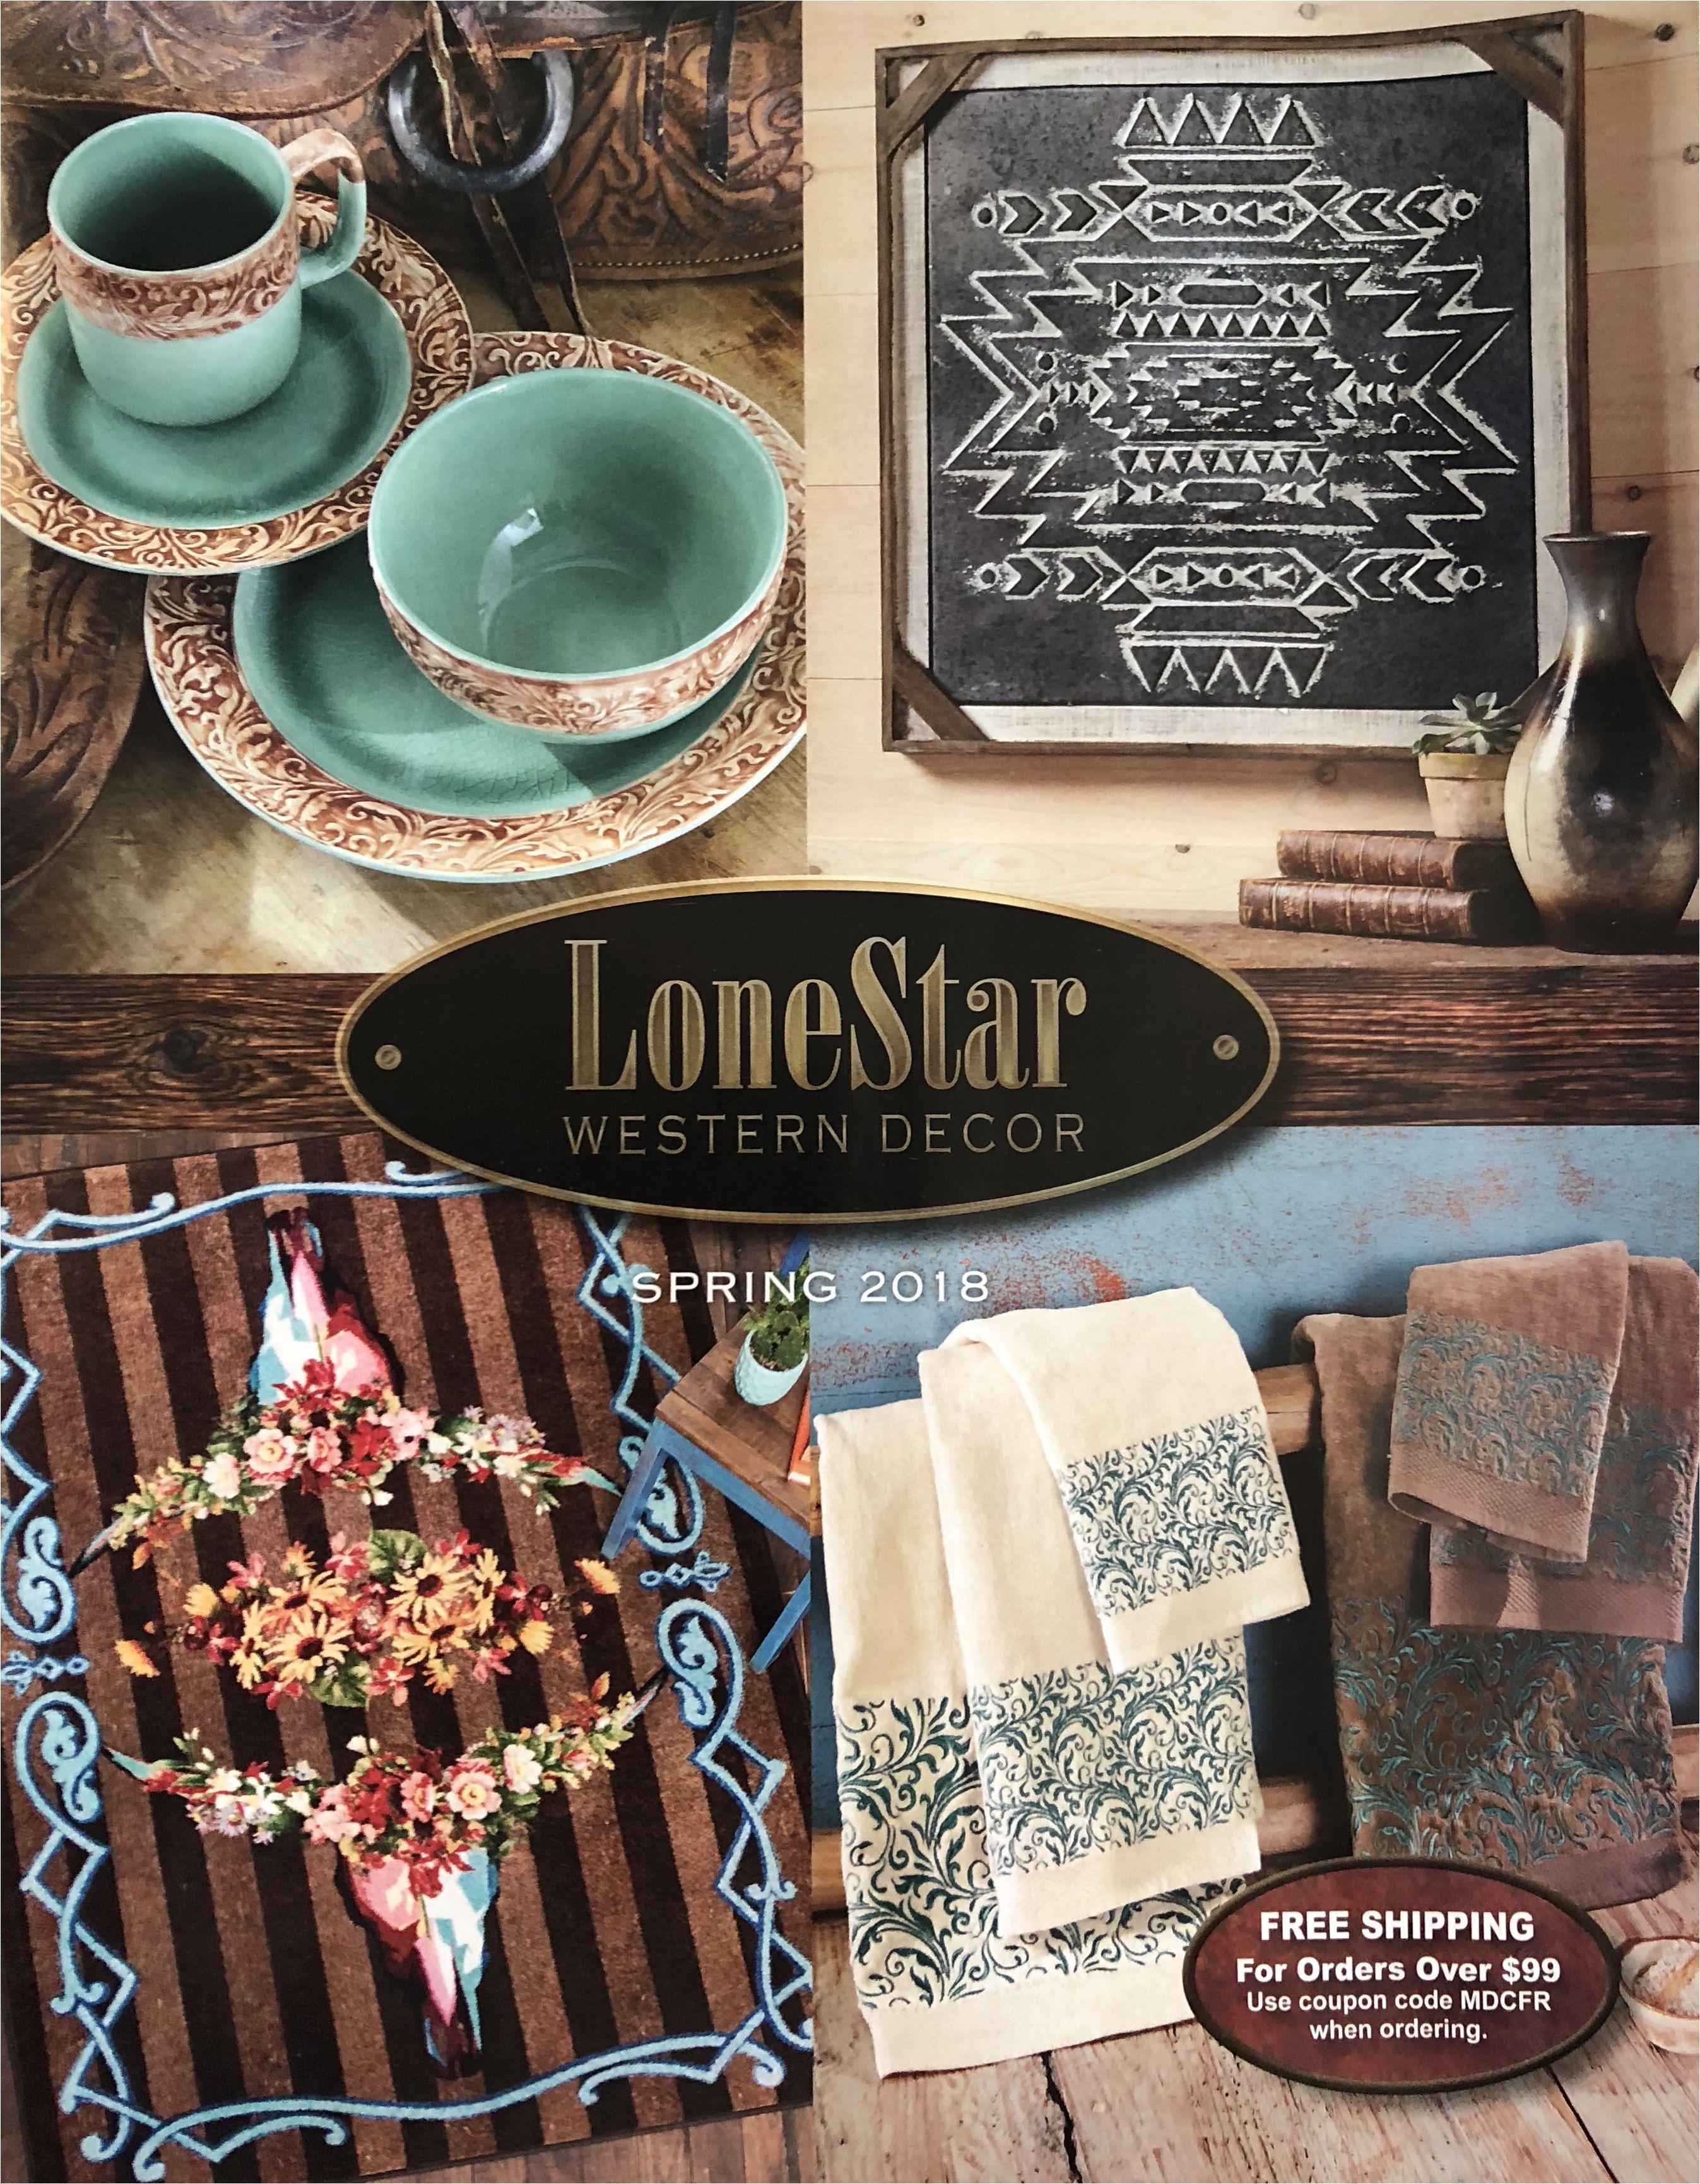 lonestar western decor catalog 5a98400a04d1cf0038929beb jpg